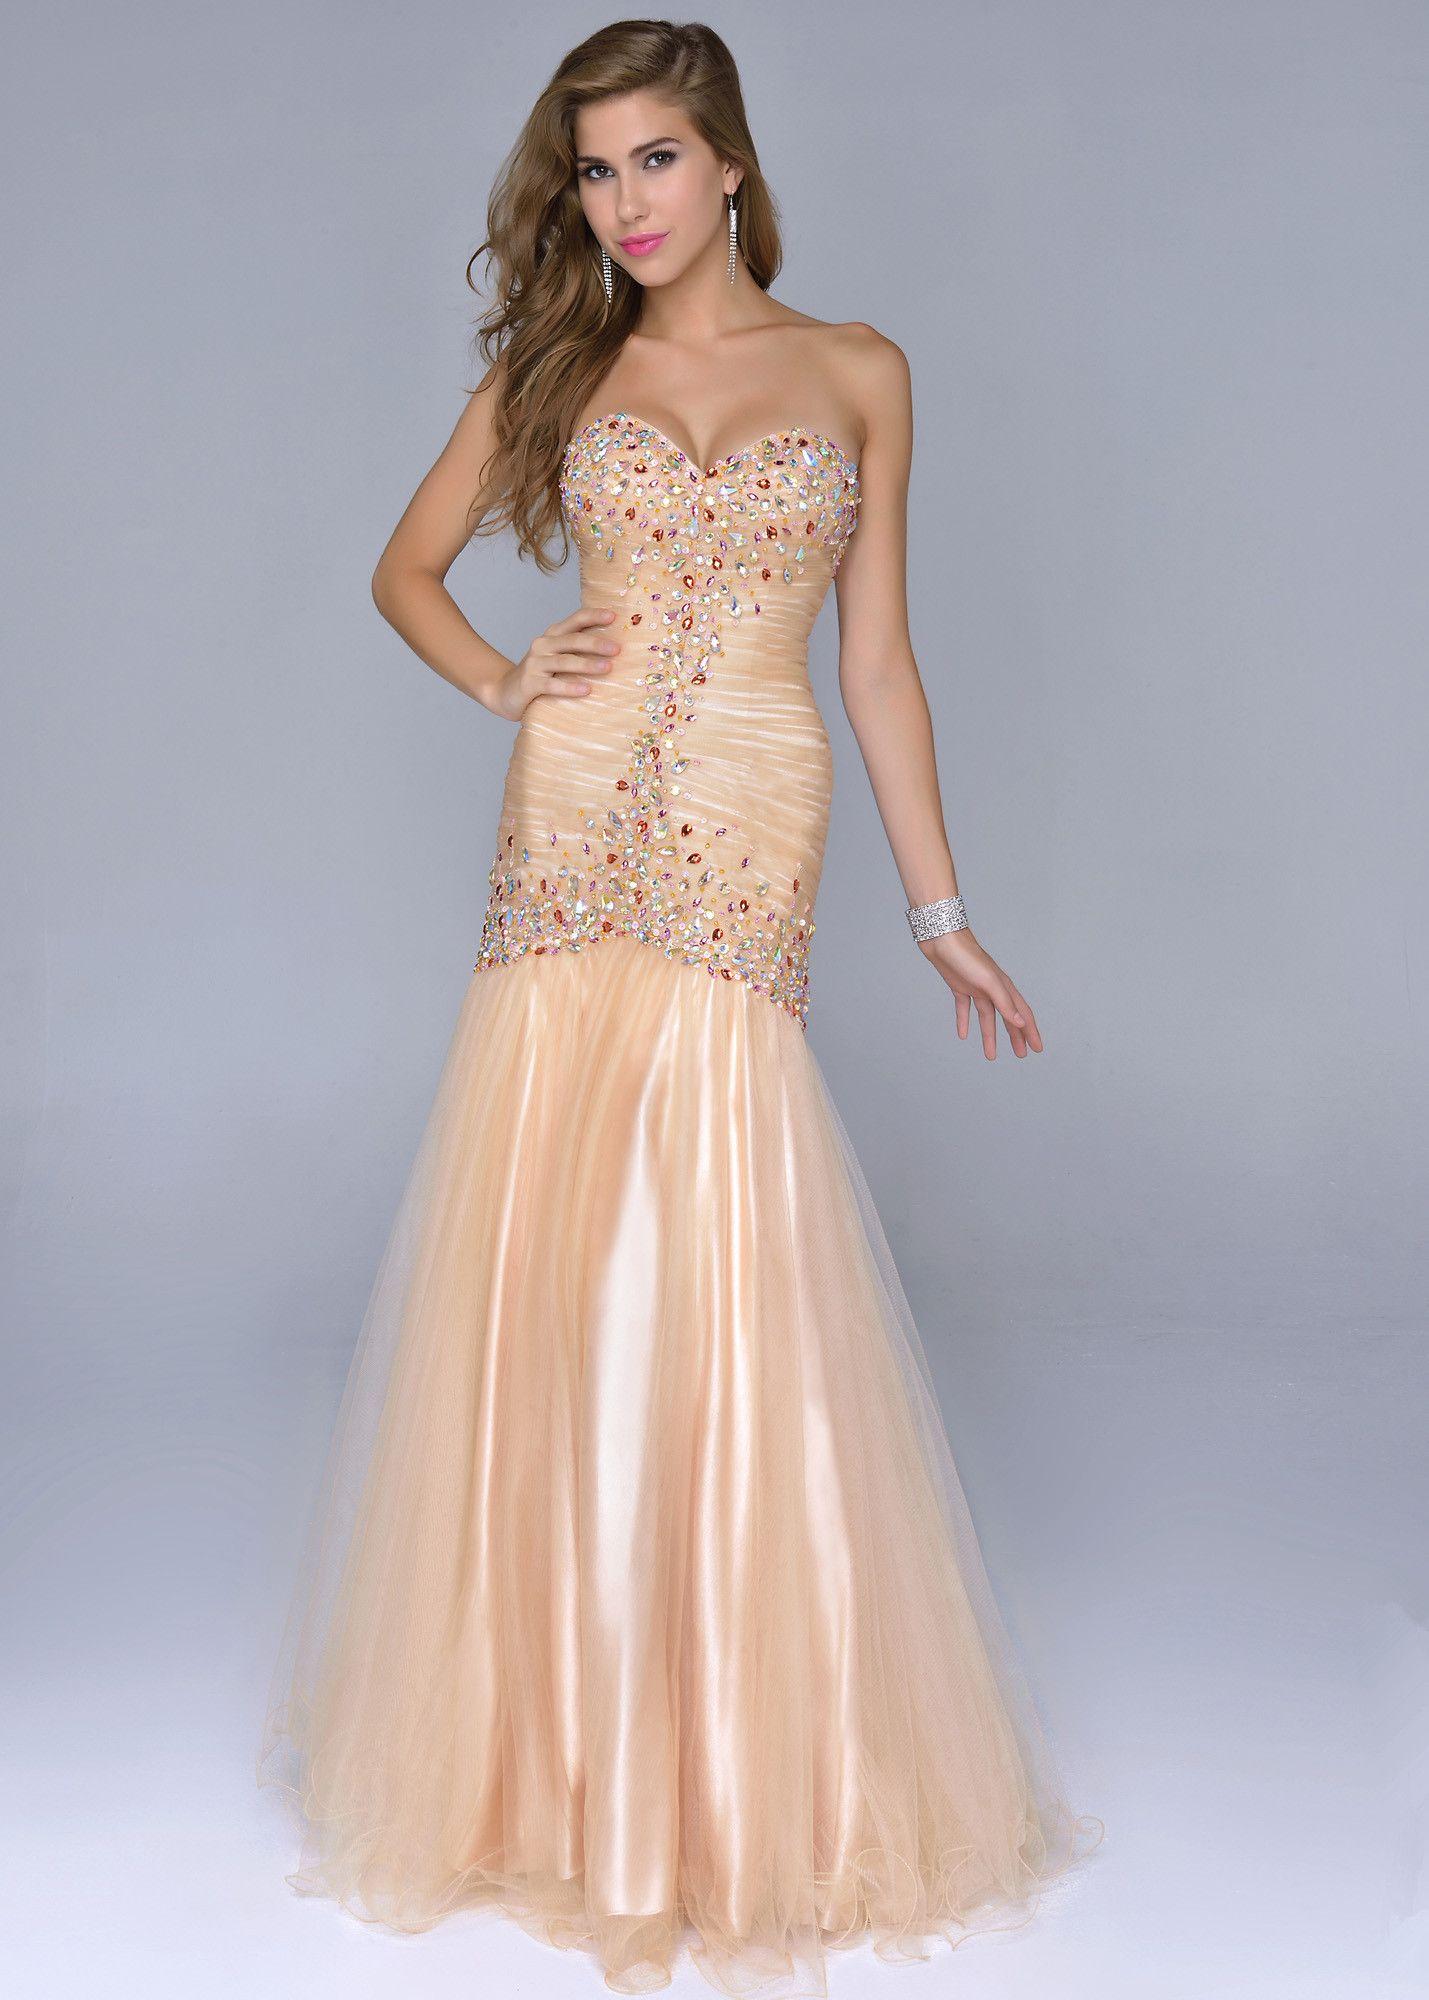 Gold Beaded Cheap Mermaid Style Prom Dresses | Dresses ...